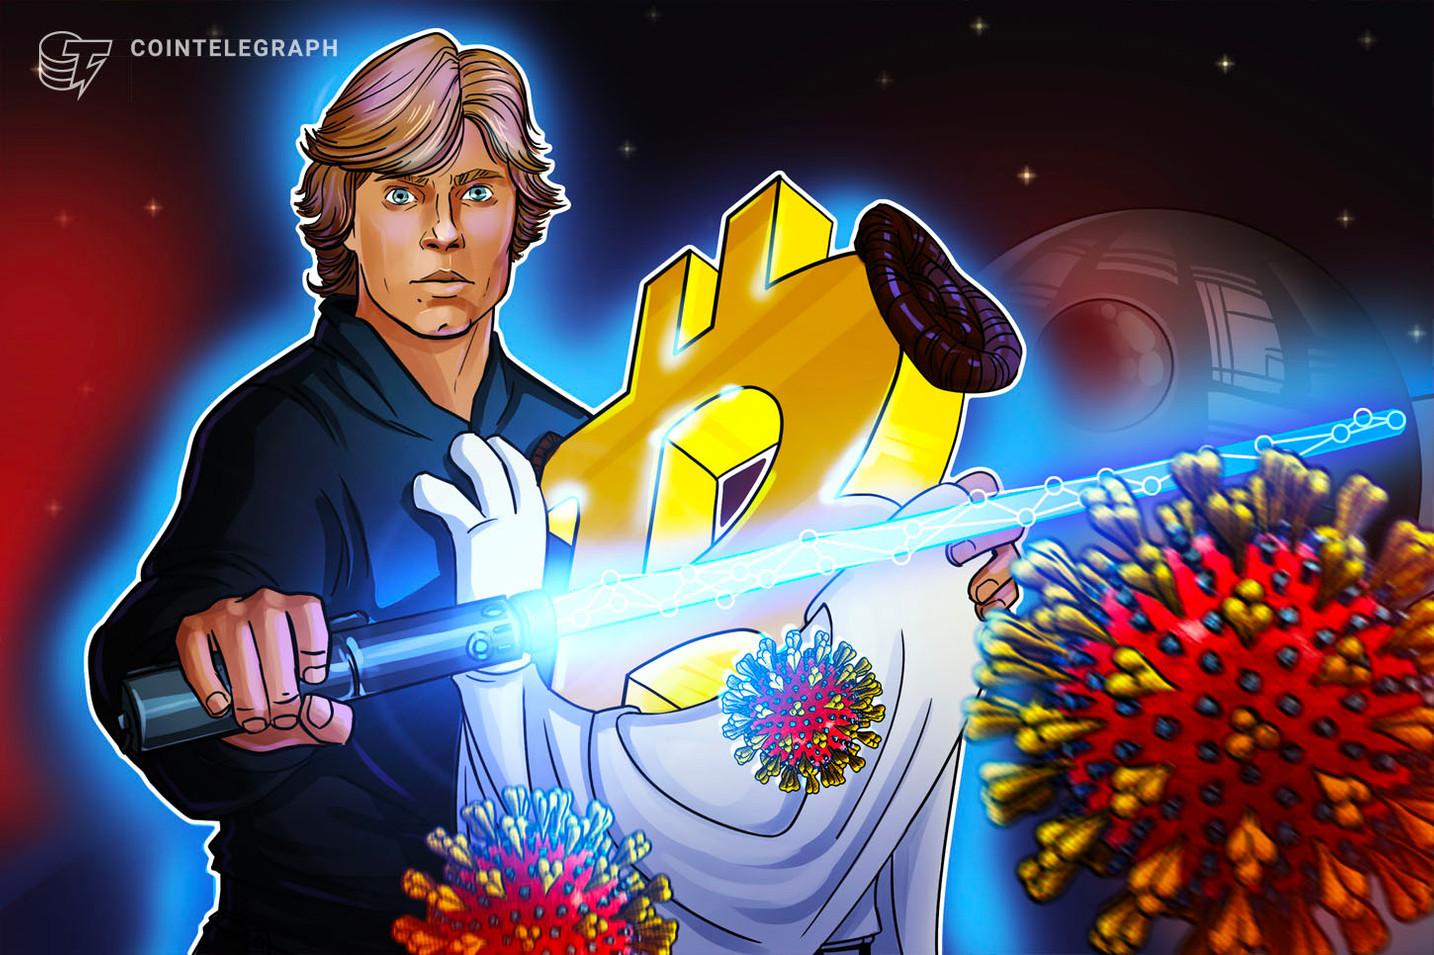 Rich Dad Poor Dad Author: Coronavirus Will Send Bitcoin 'Parabolic'